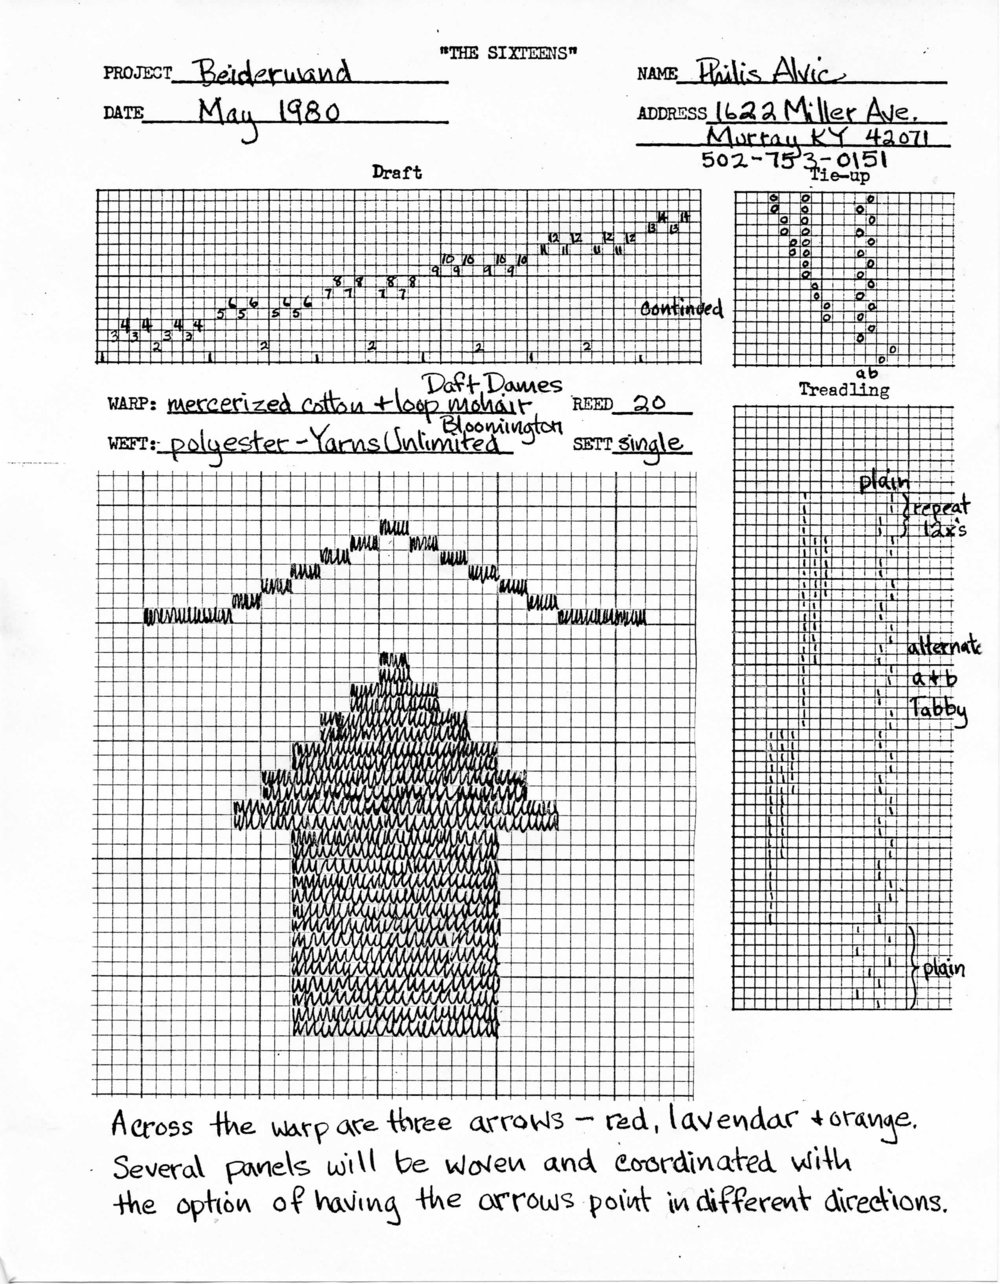 1980_Page_1_Image_0001.jpg